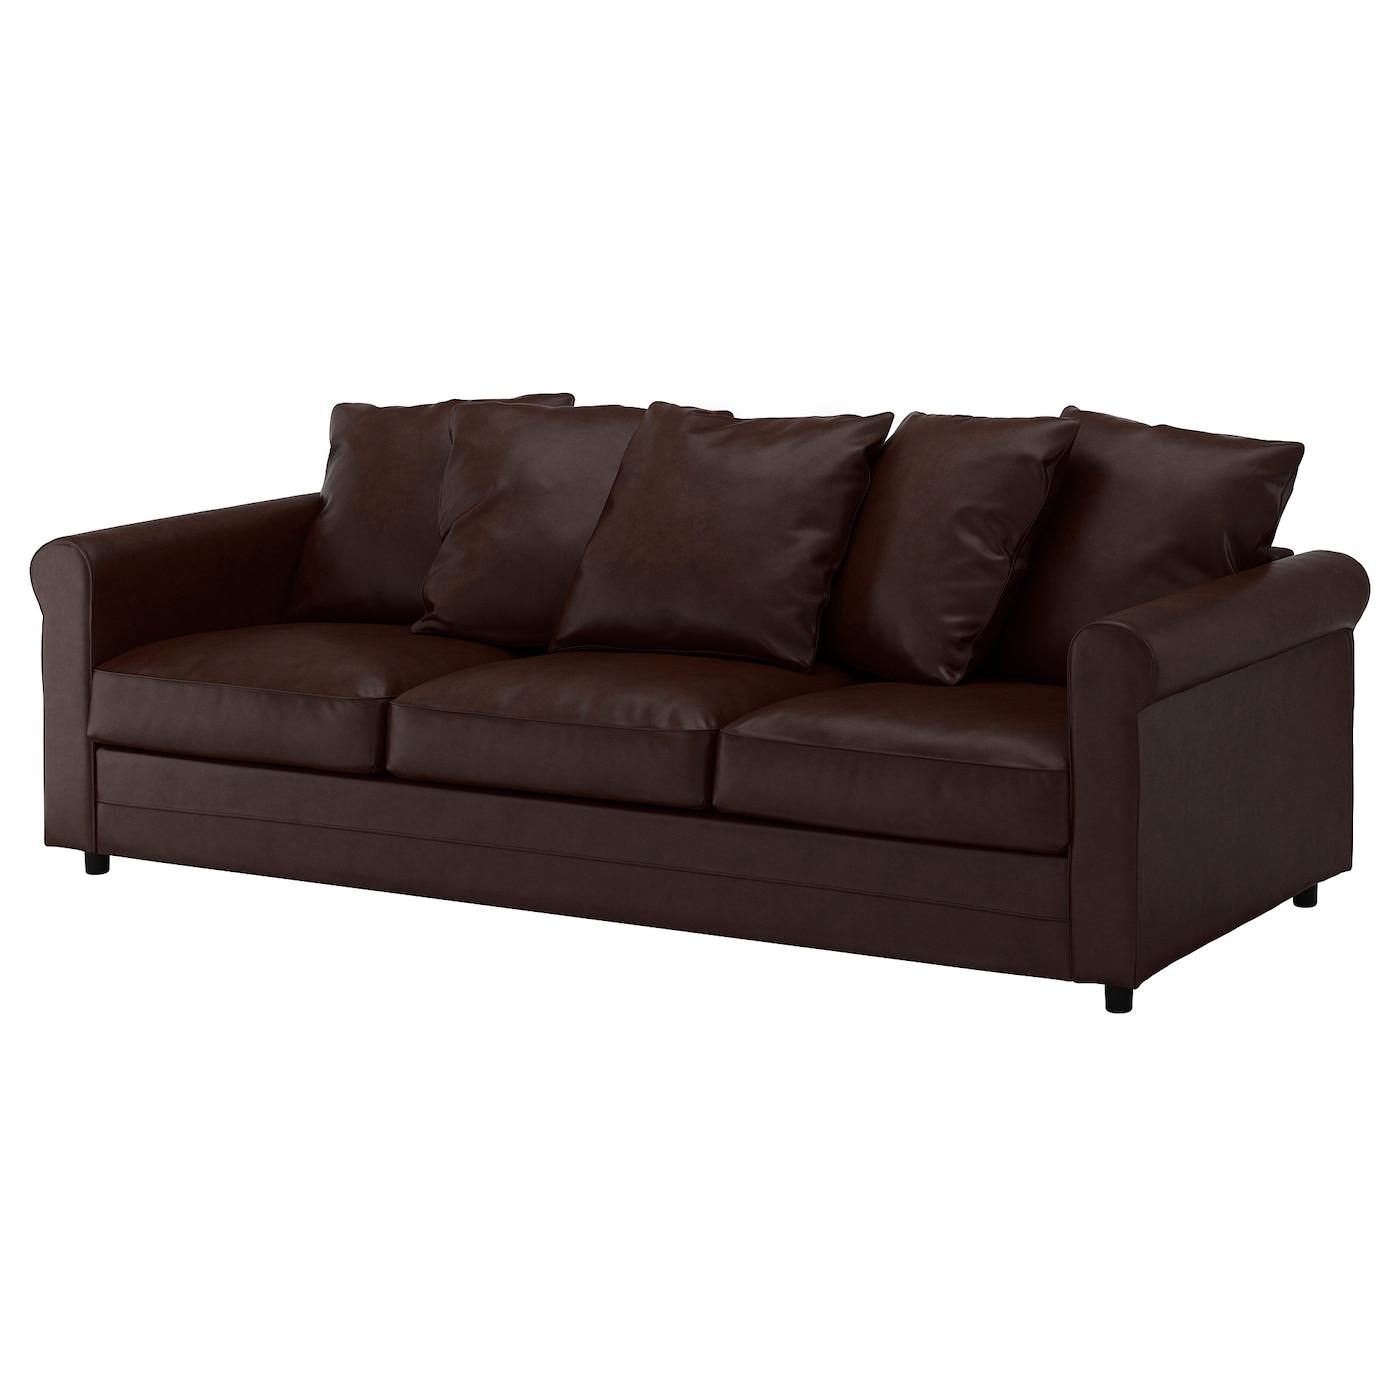 GRÖNLID 3-seat sofa, Kimstad dark brown